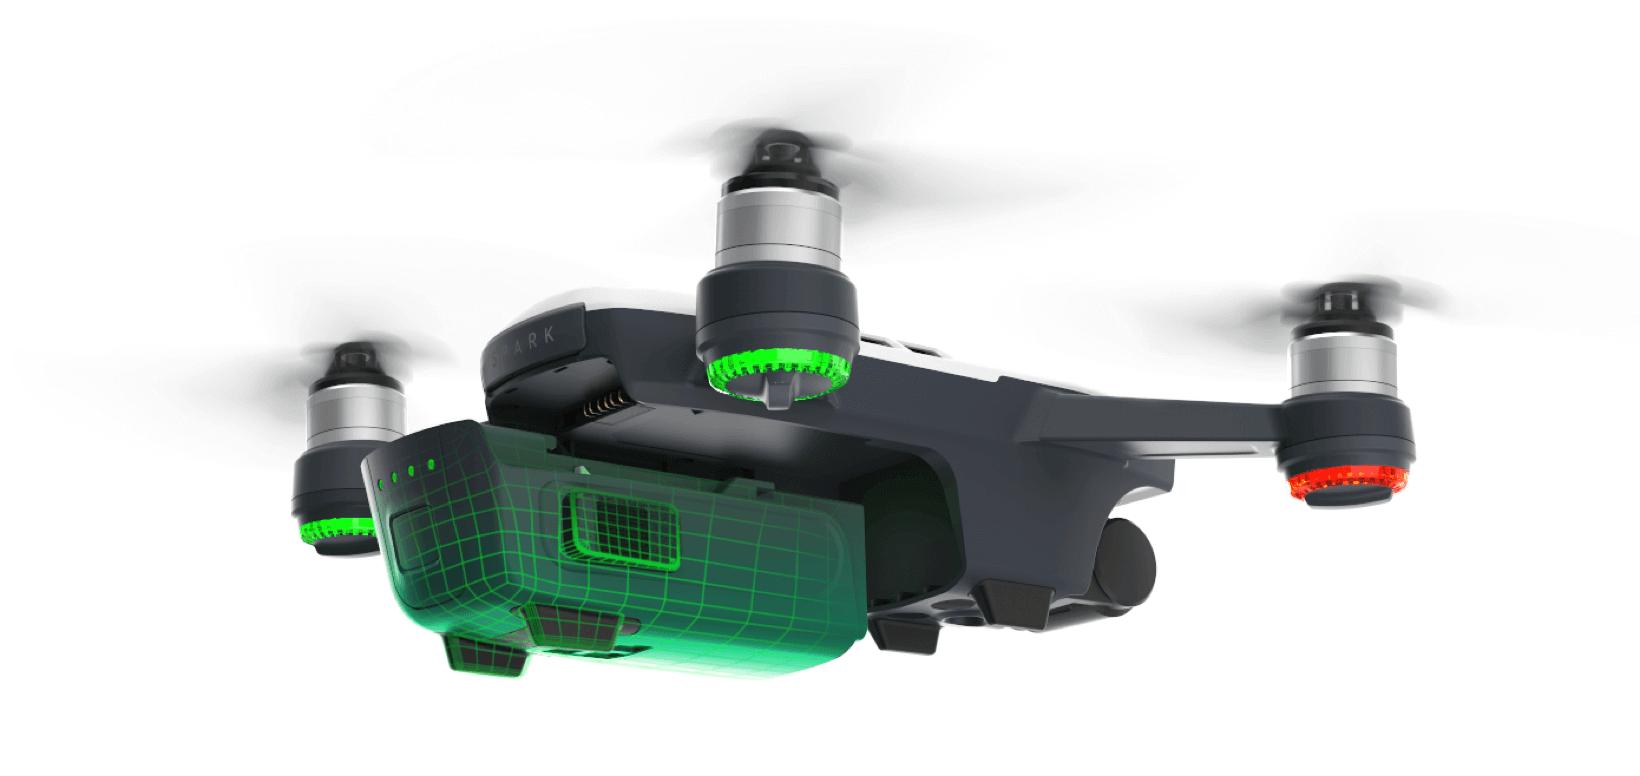 DJI Mavic air fly more kameradrohne 4k HDR 12mp Multicopter quadrocopter blanco